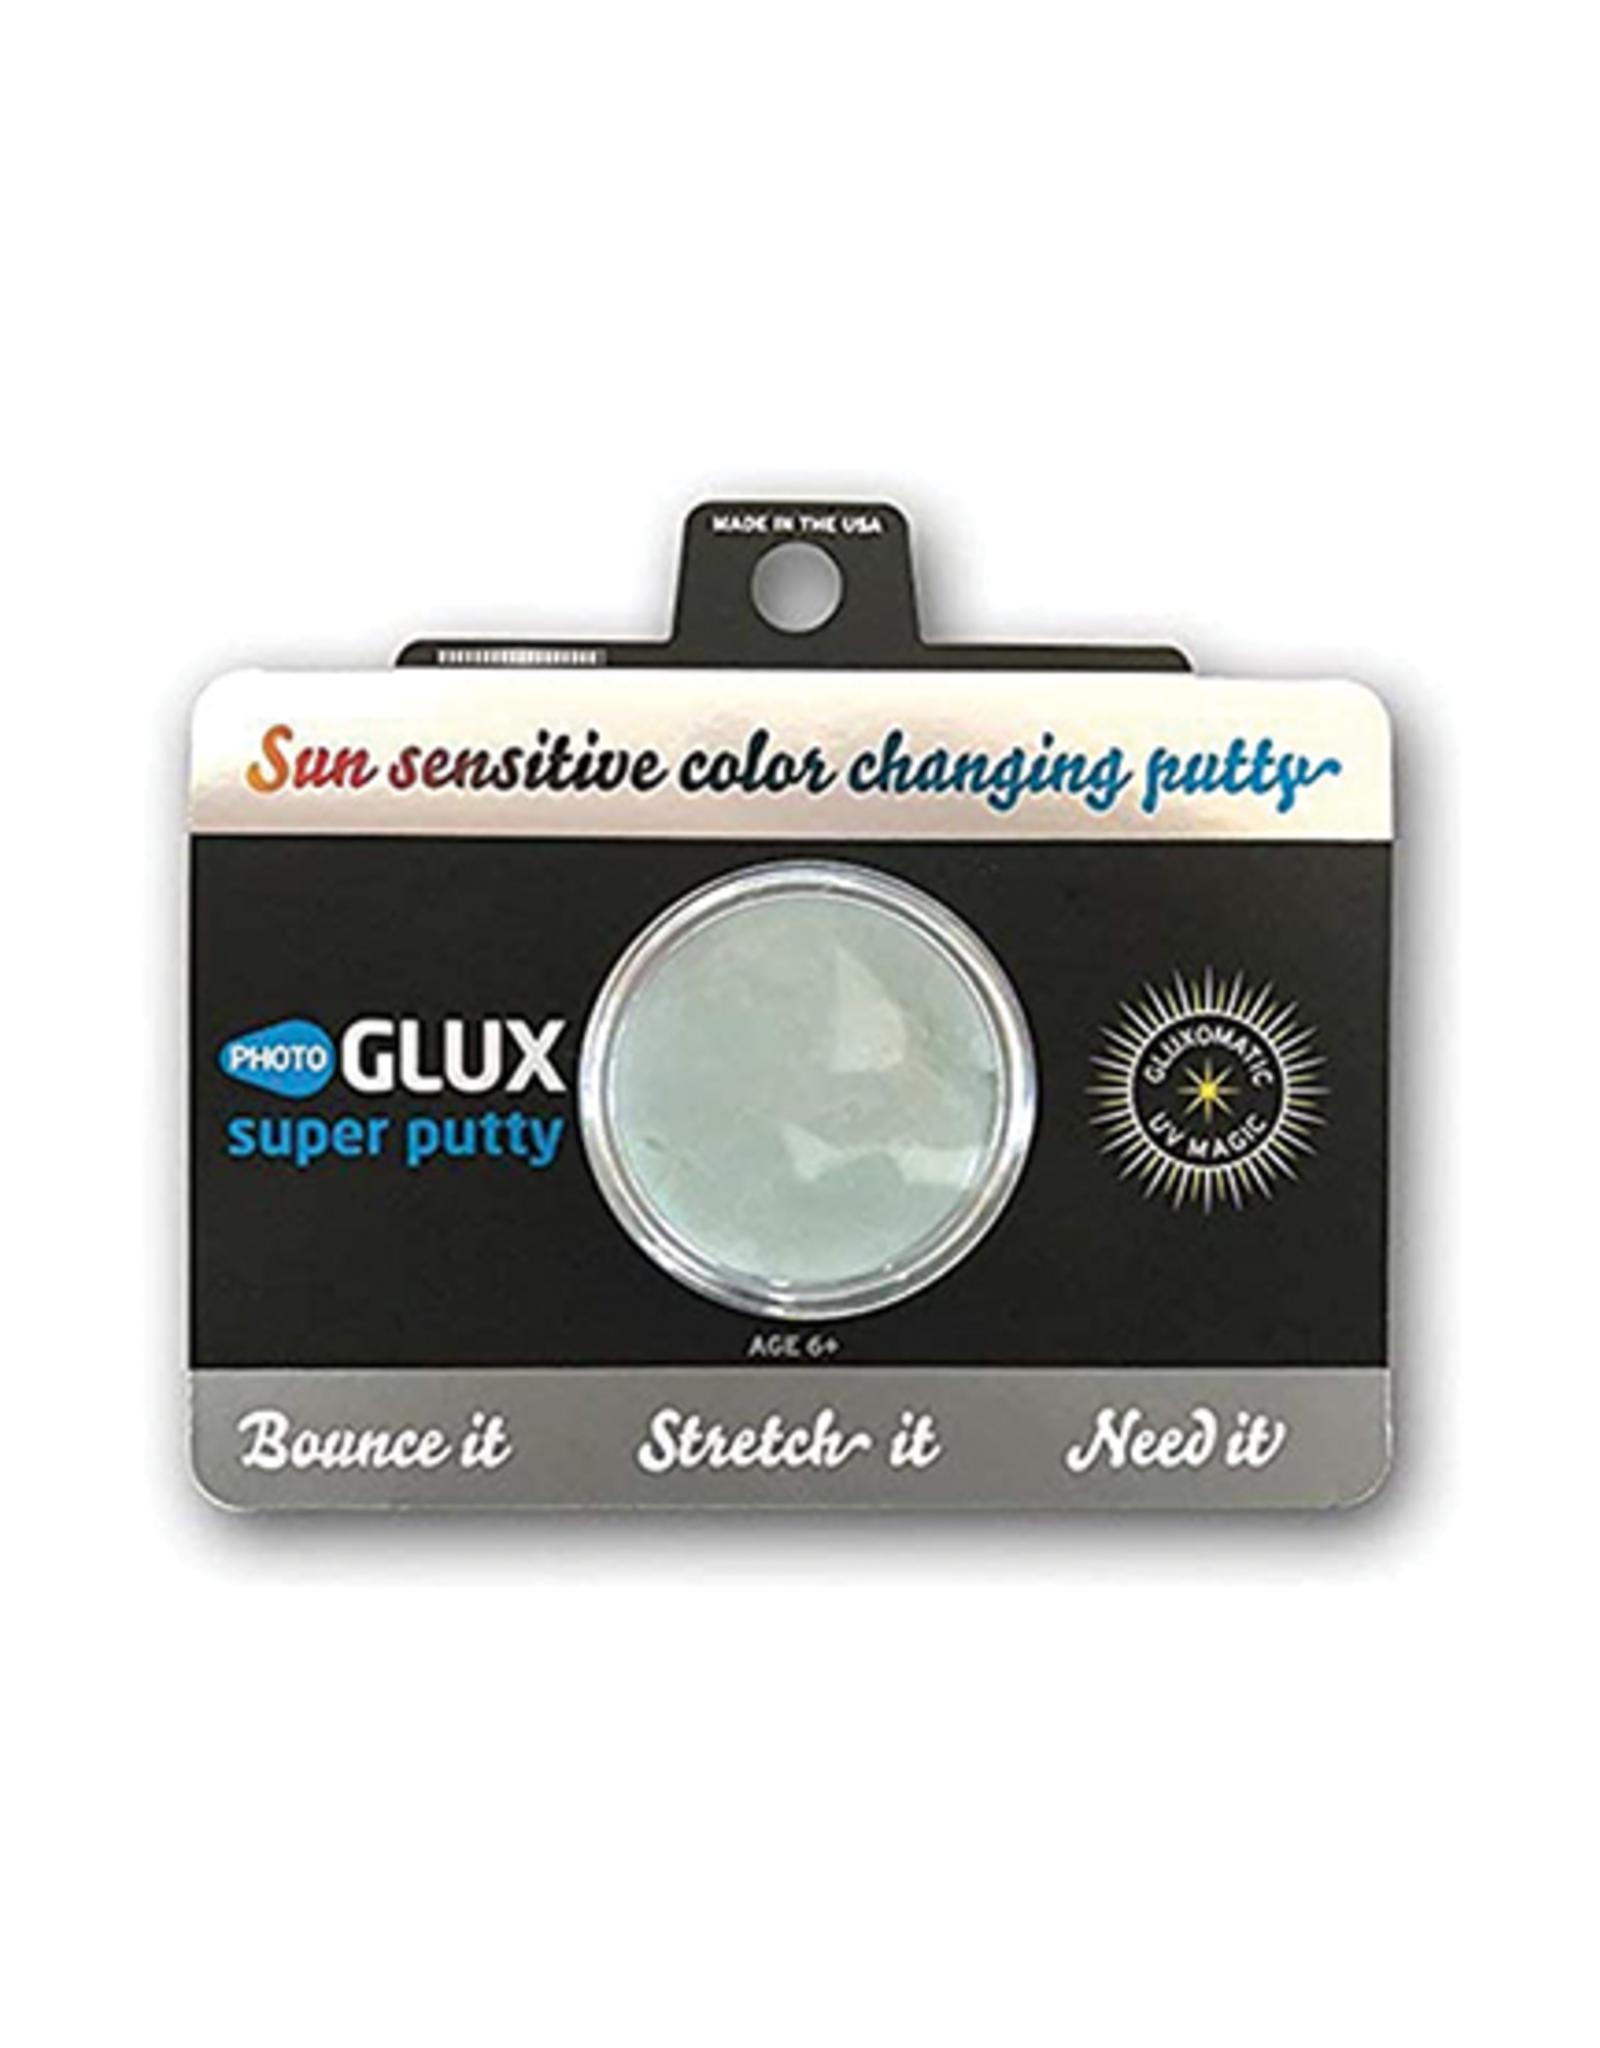 Copernicus Toys GLUX: Photo